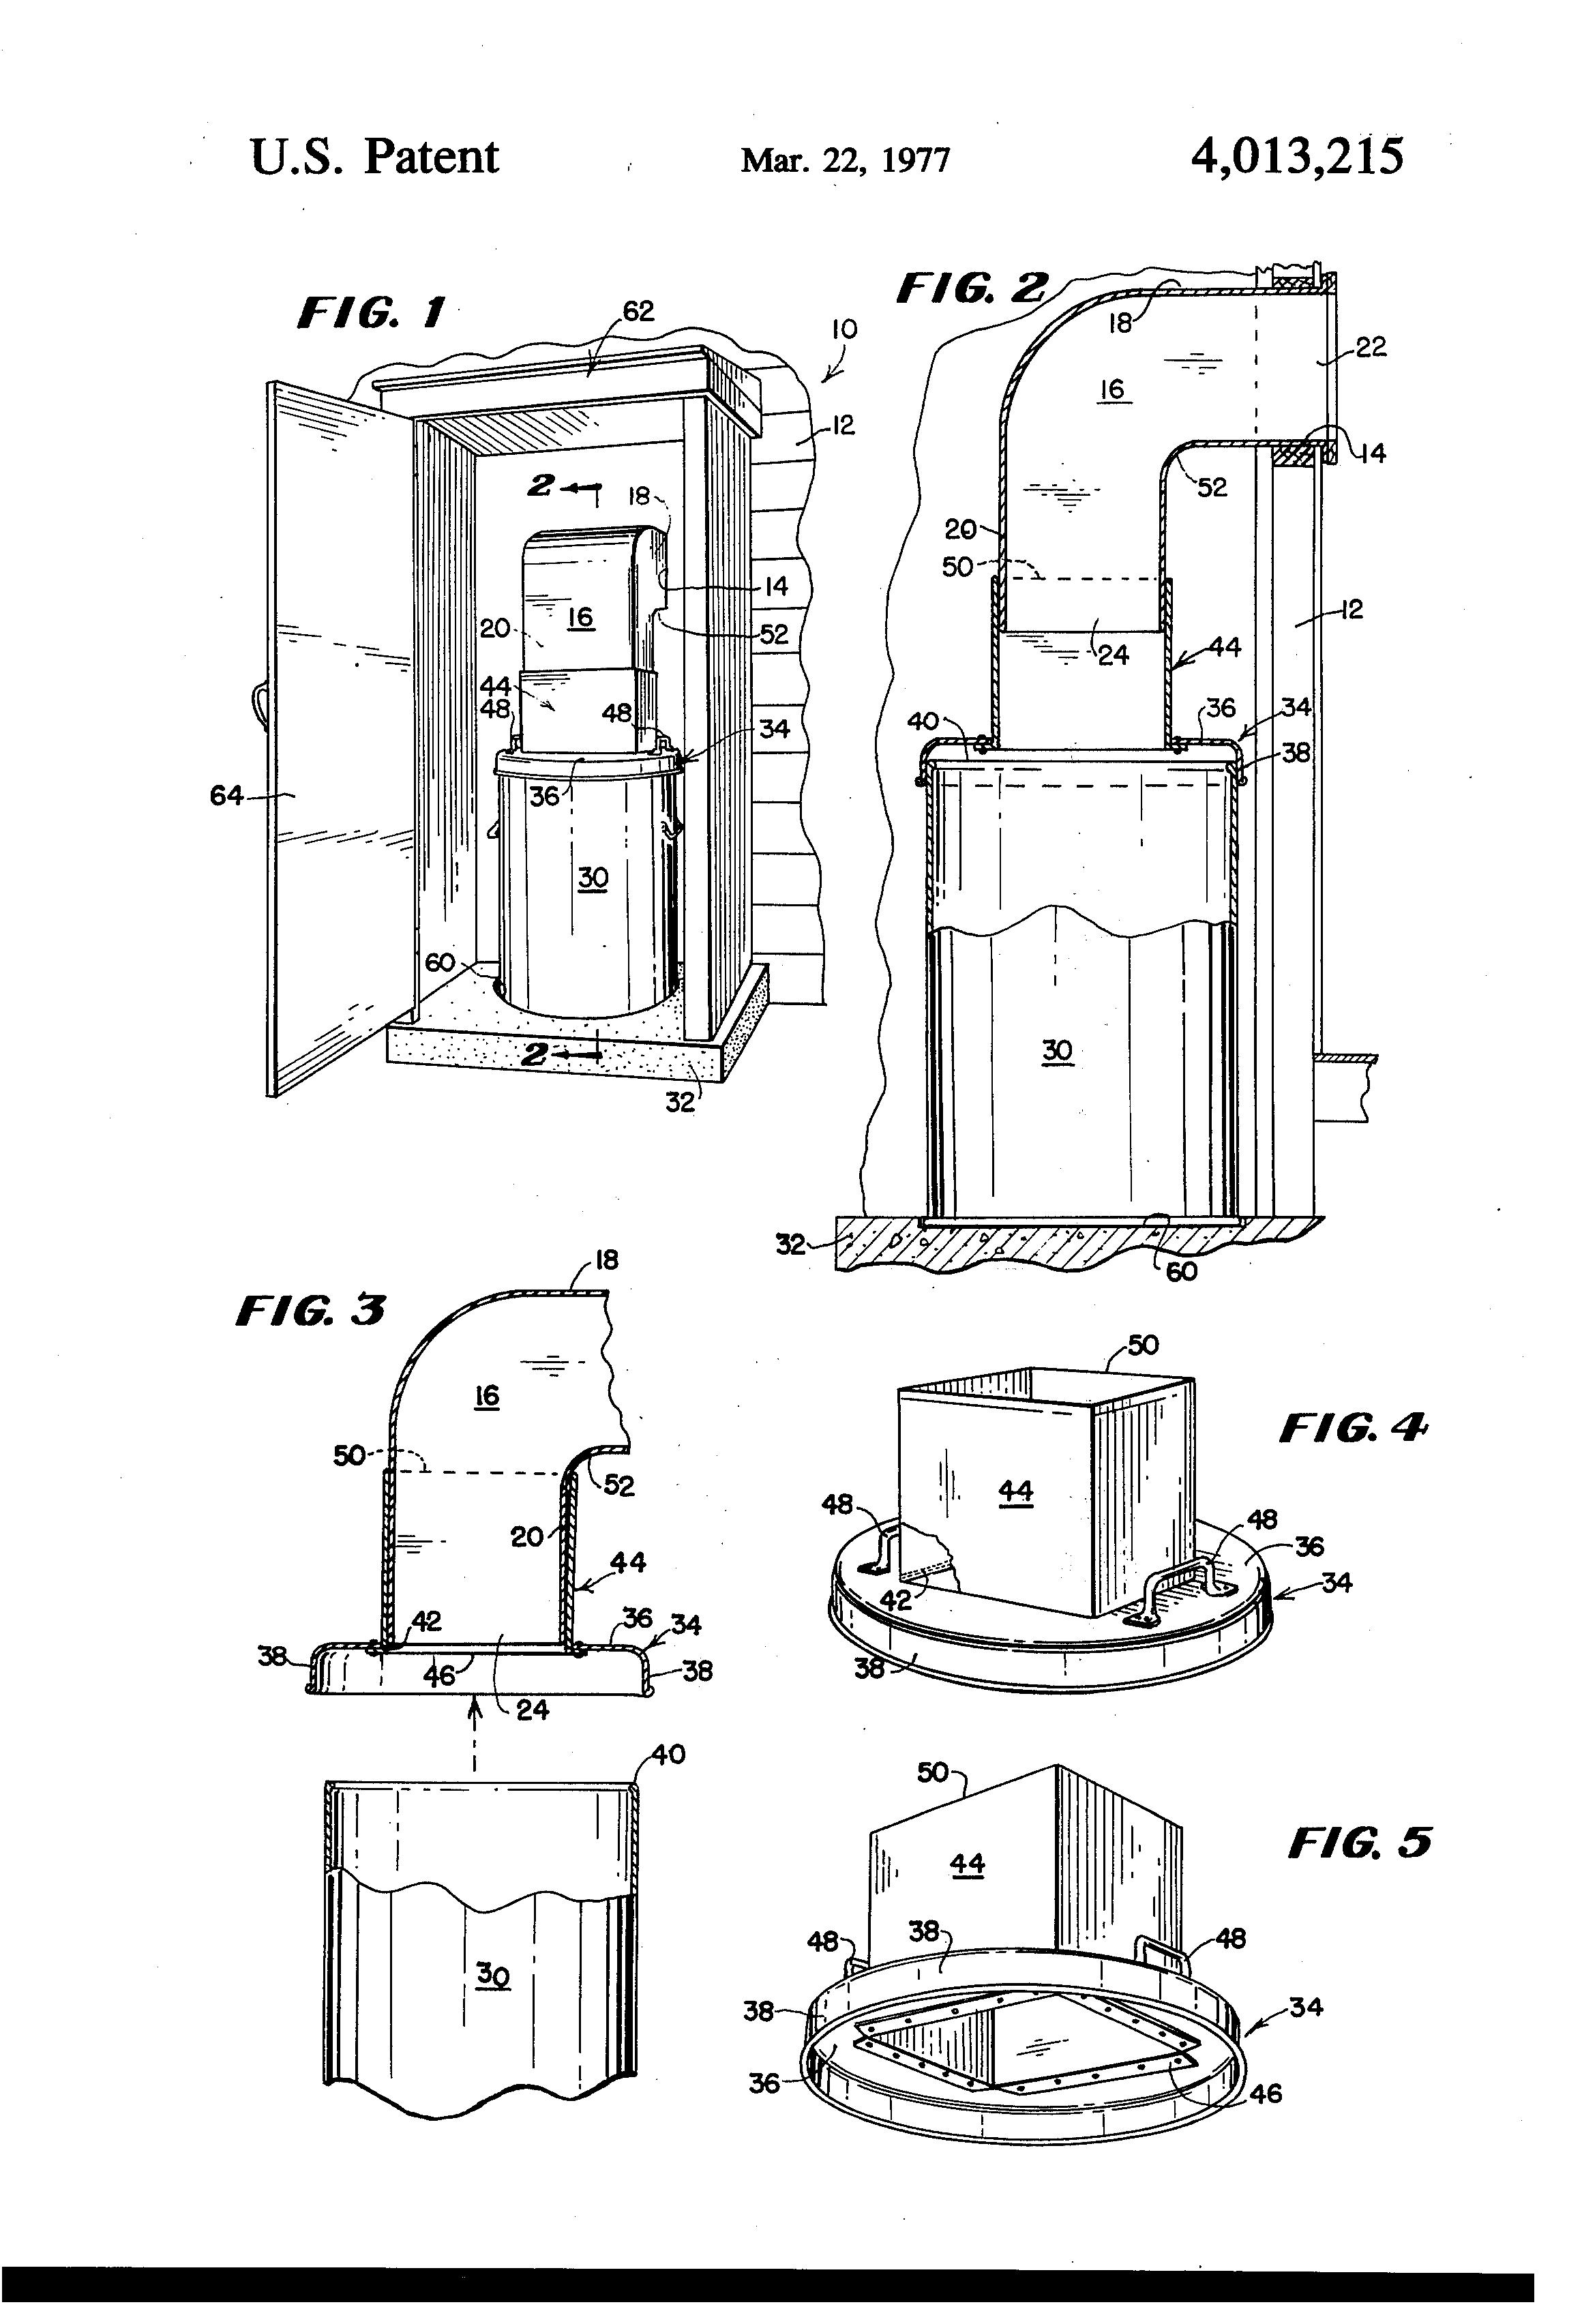 Trash Chute Details : Patent us trash disposal apparatus google patenten